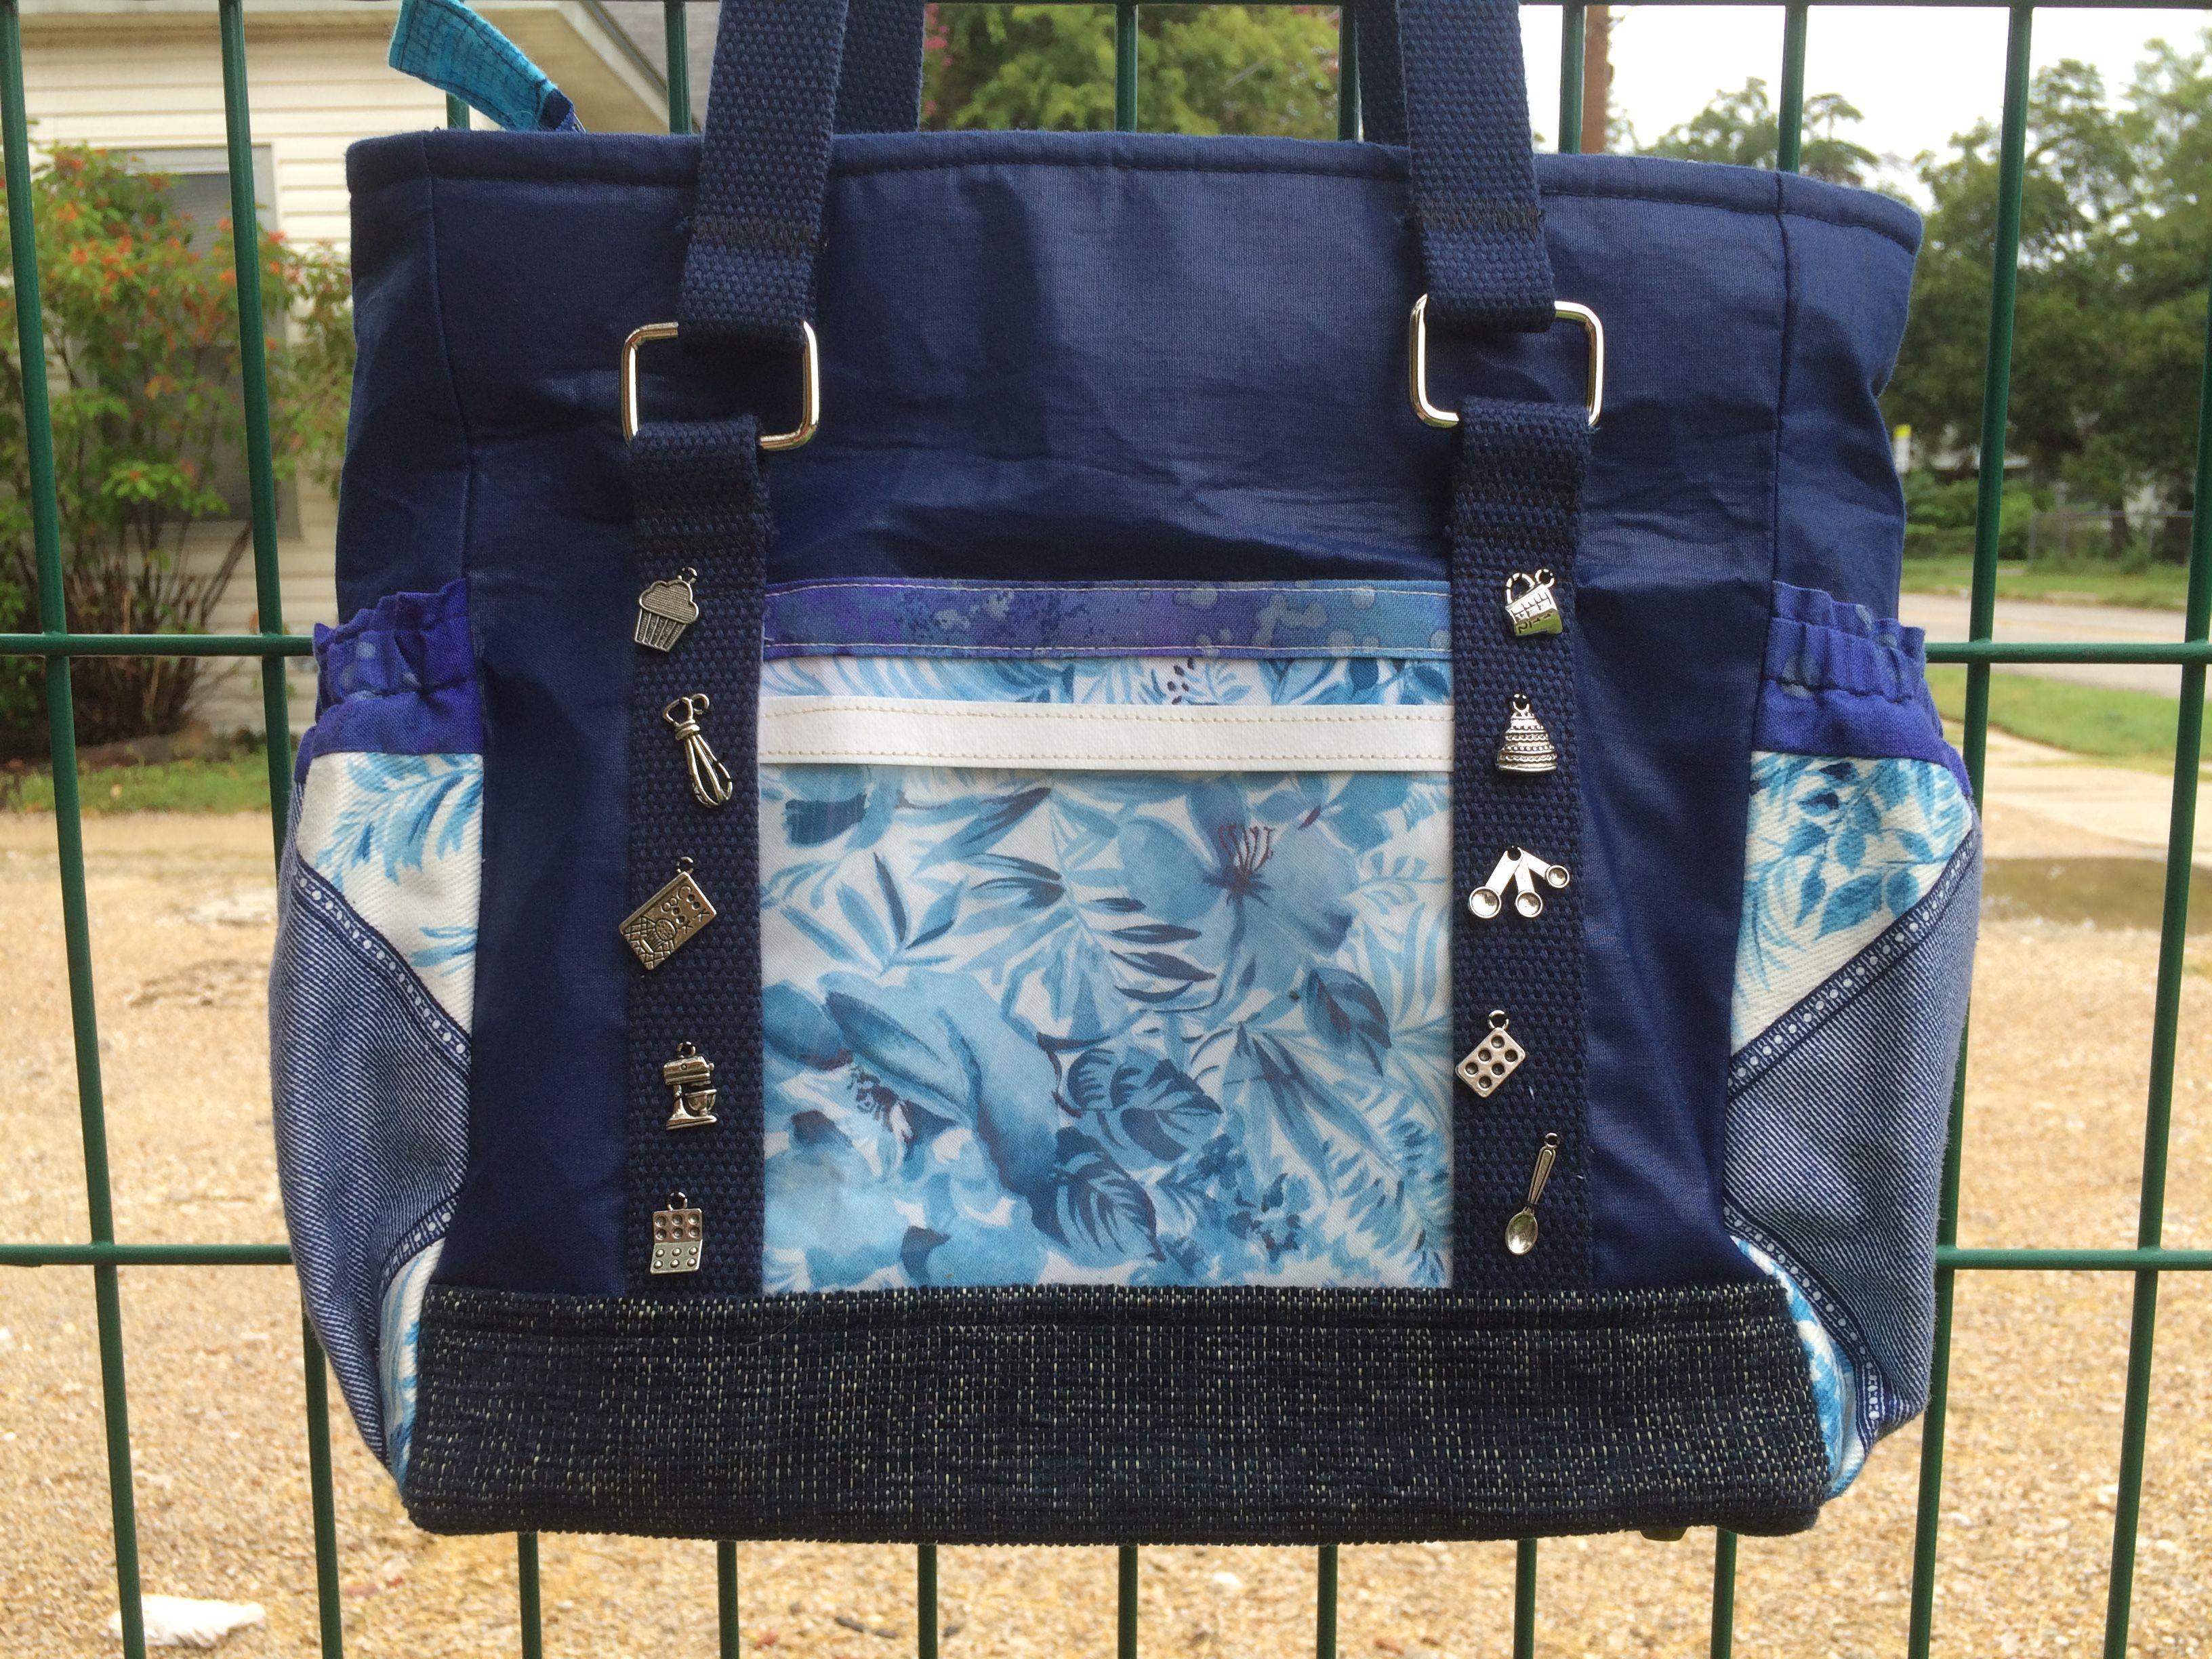 76767c1fedef Proj   23 - Mini Professional Tote by the Creative Thimble - aka  Terri s  Bag